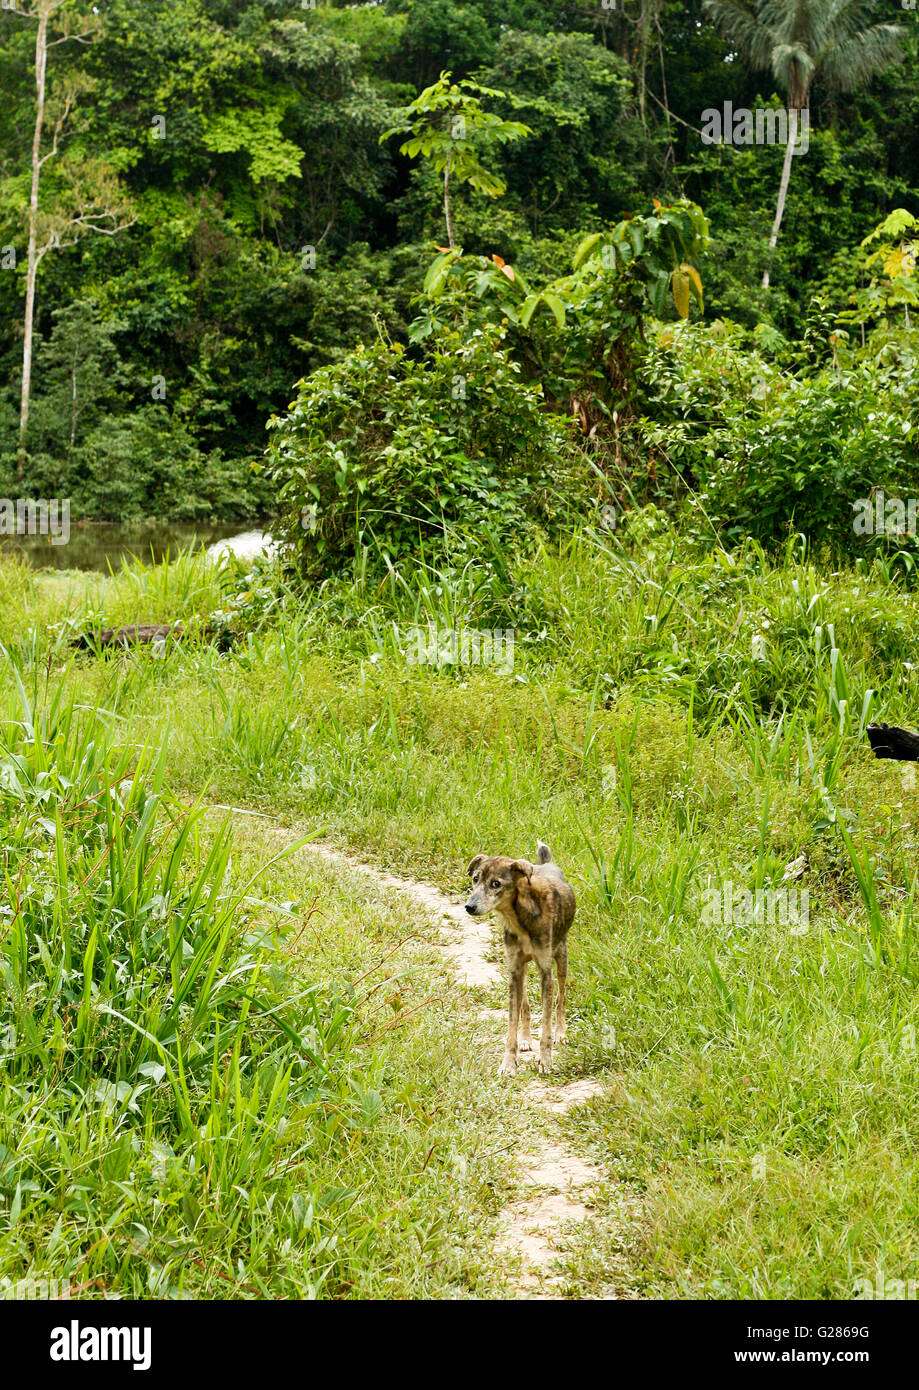 Dog. Buen Peru. Amazon rainforest. Peru - Stock Image